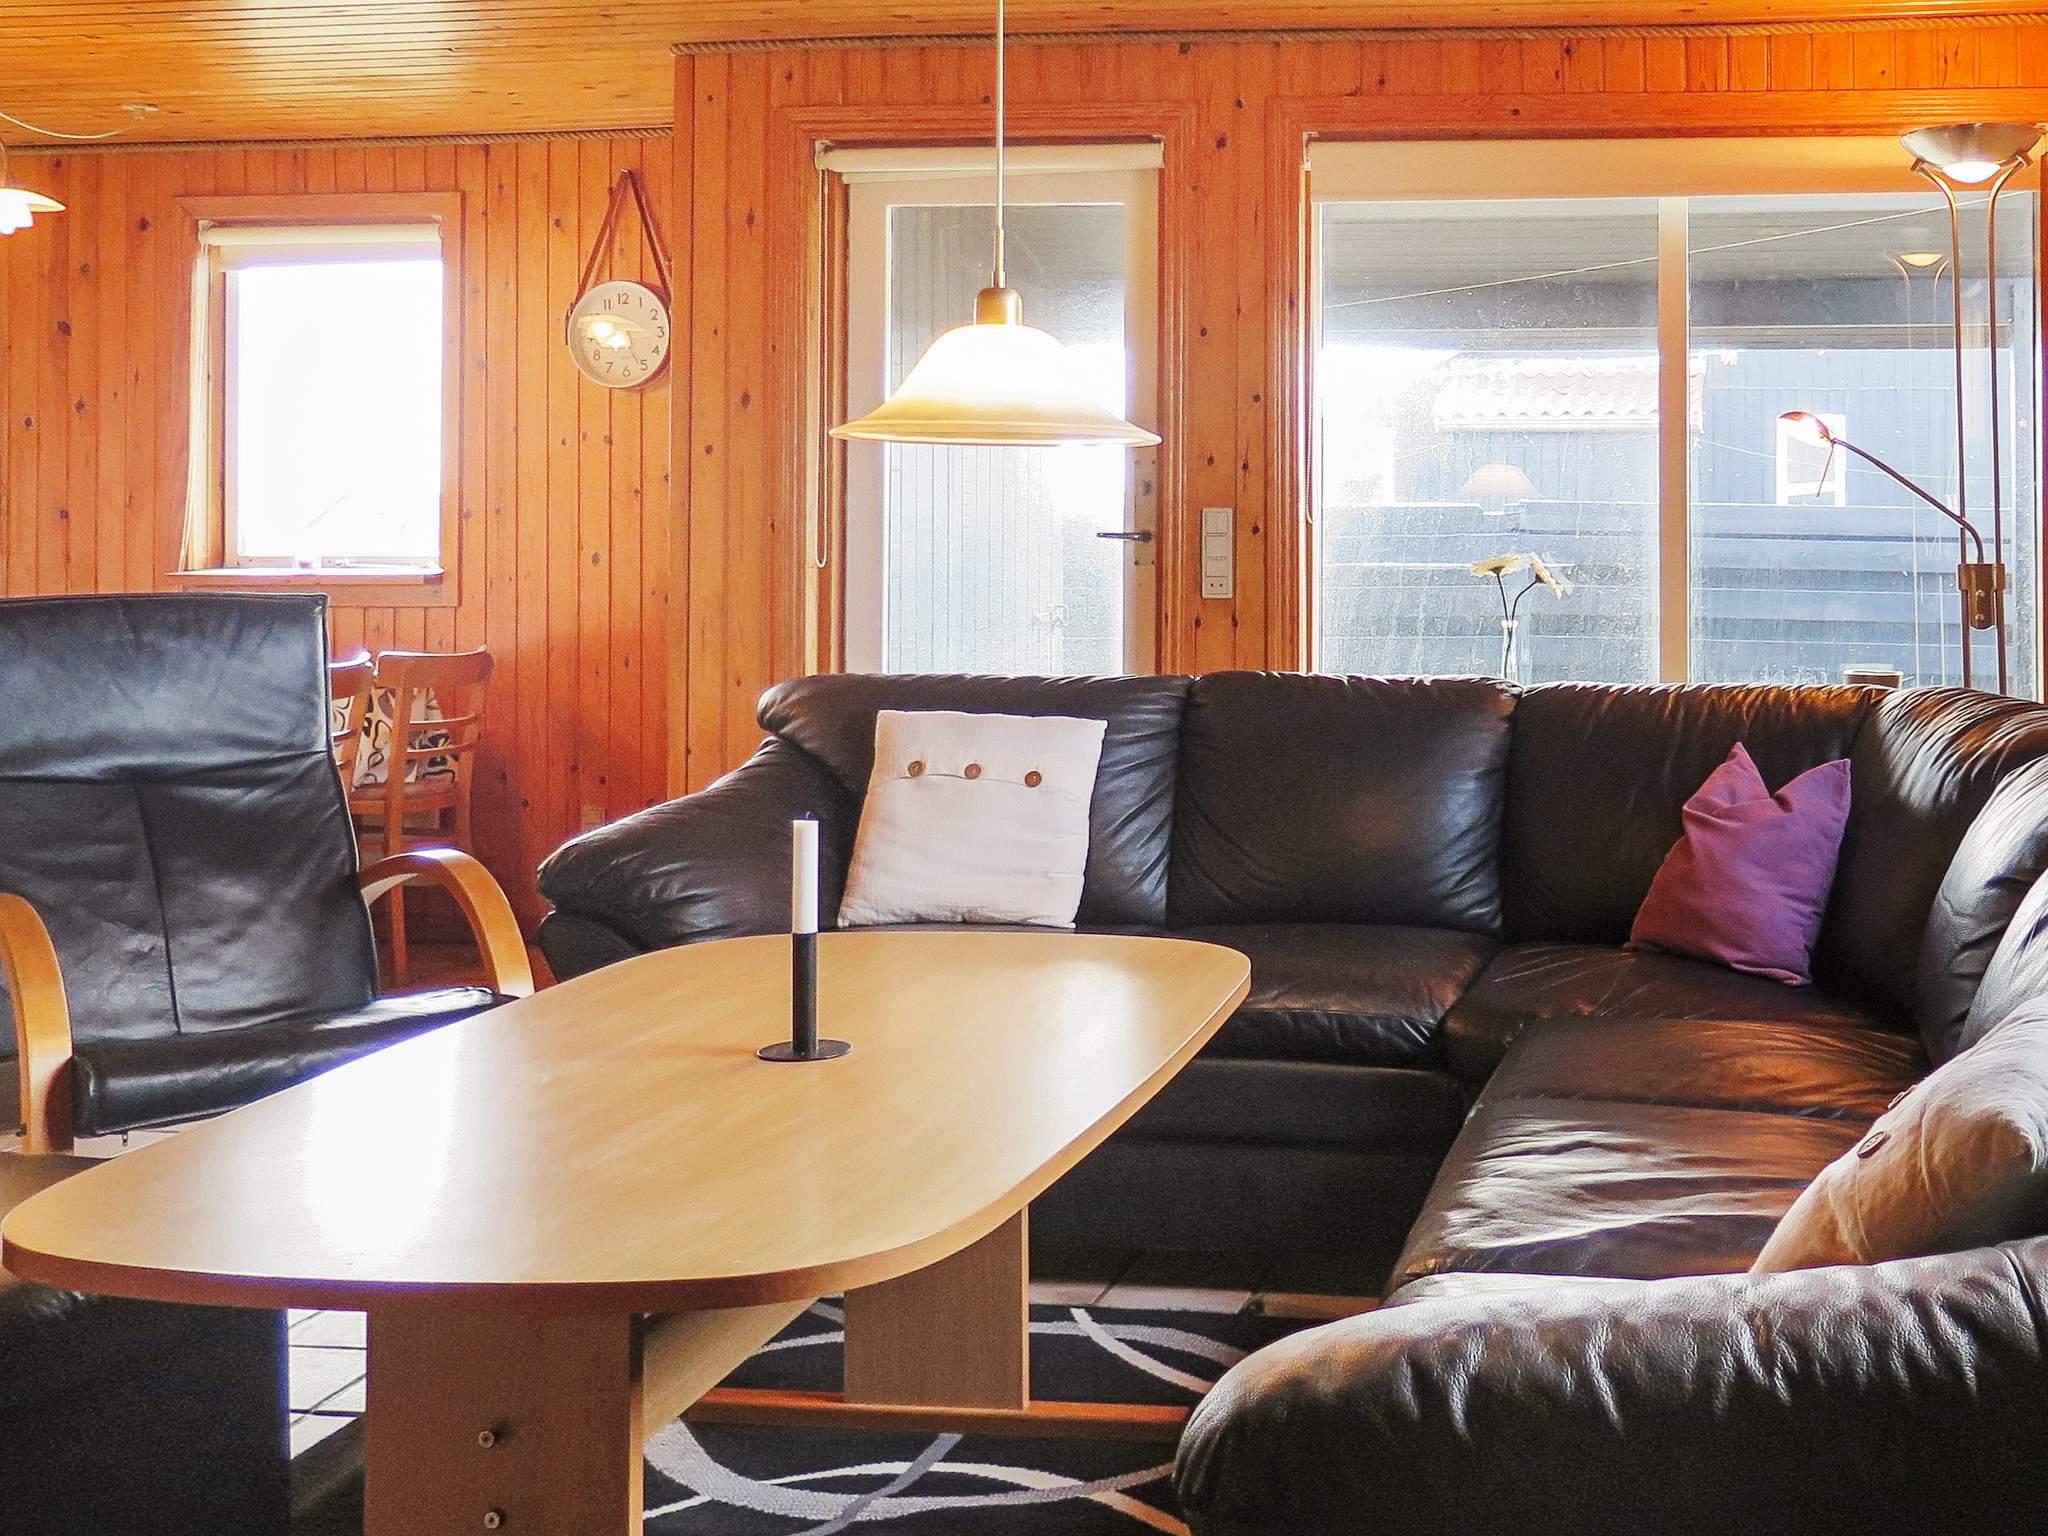 Ferienhaus Vrist (83580), Vrist, , Limfjord, Dänemark, Bild 4